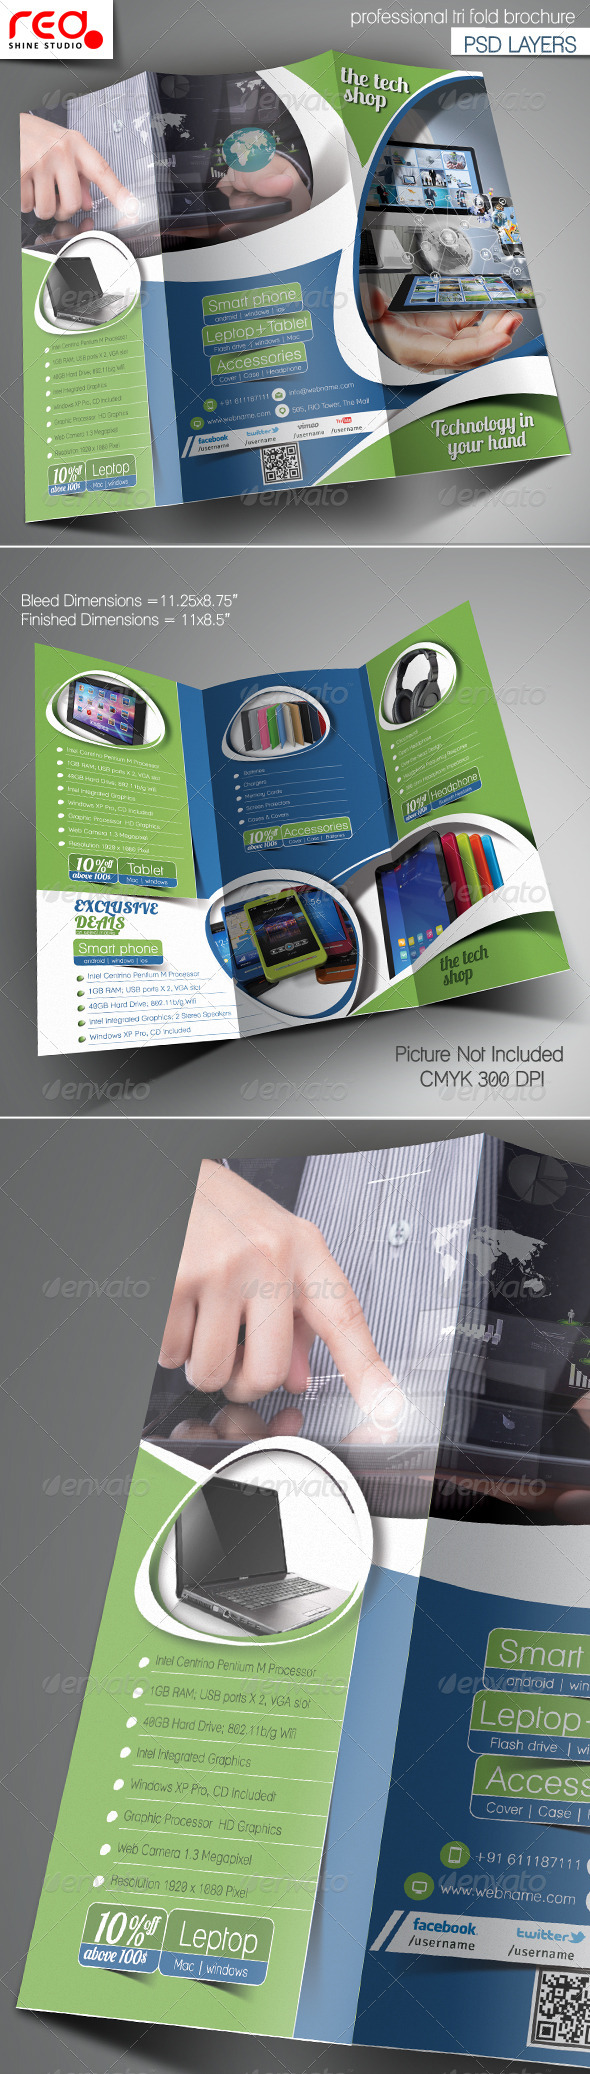 Multipurpose Promotion Trifold Brochure Template - Corporate Brochures